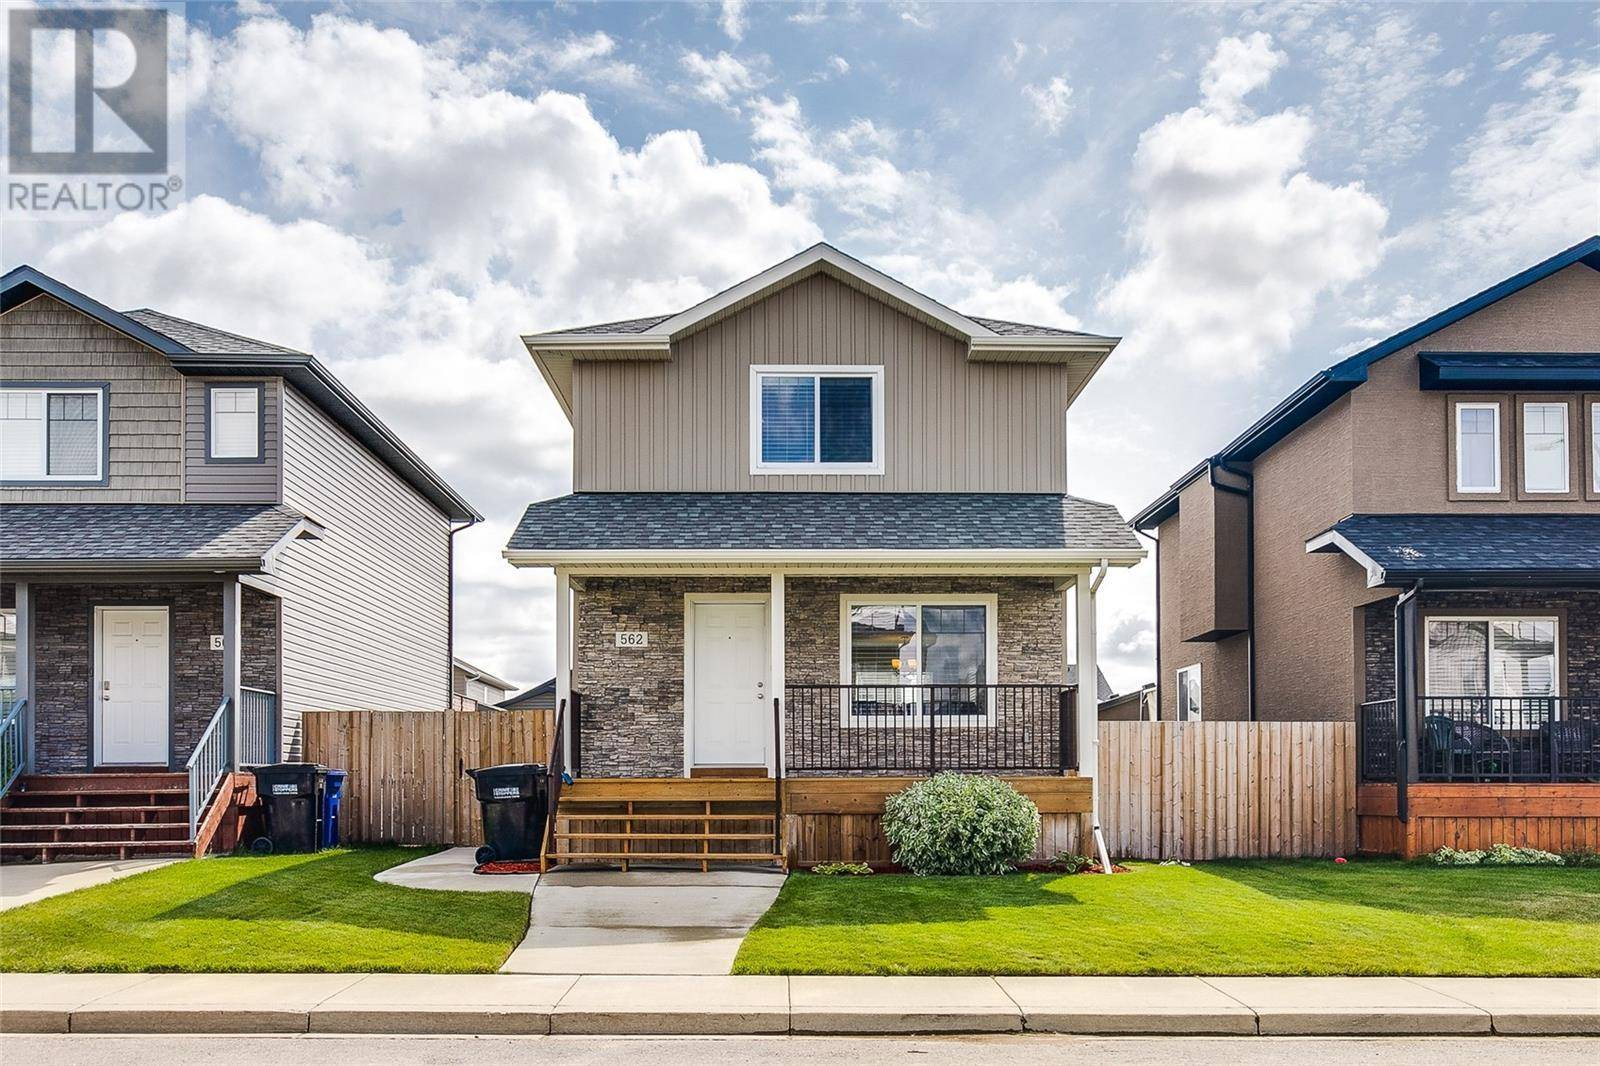 House for sale at 562 Geary Cres Saskatoon Saskatchewan - MLS: SK783452